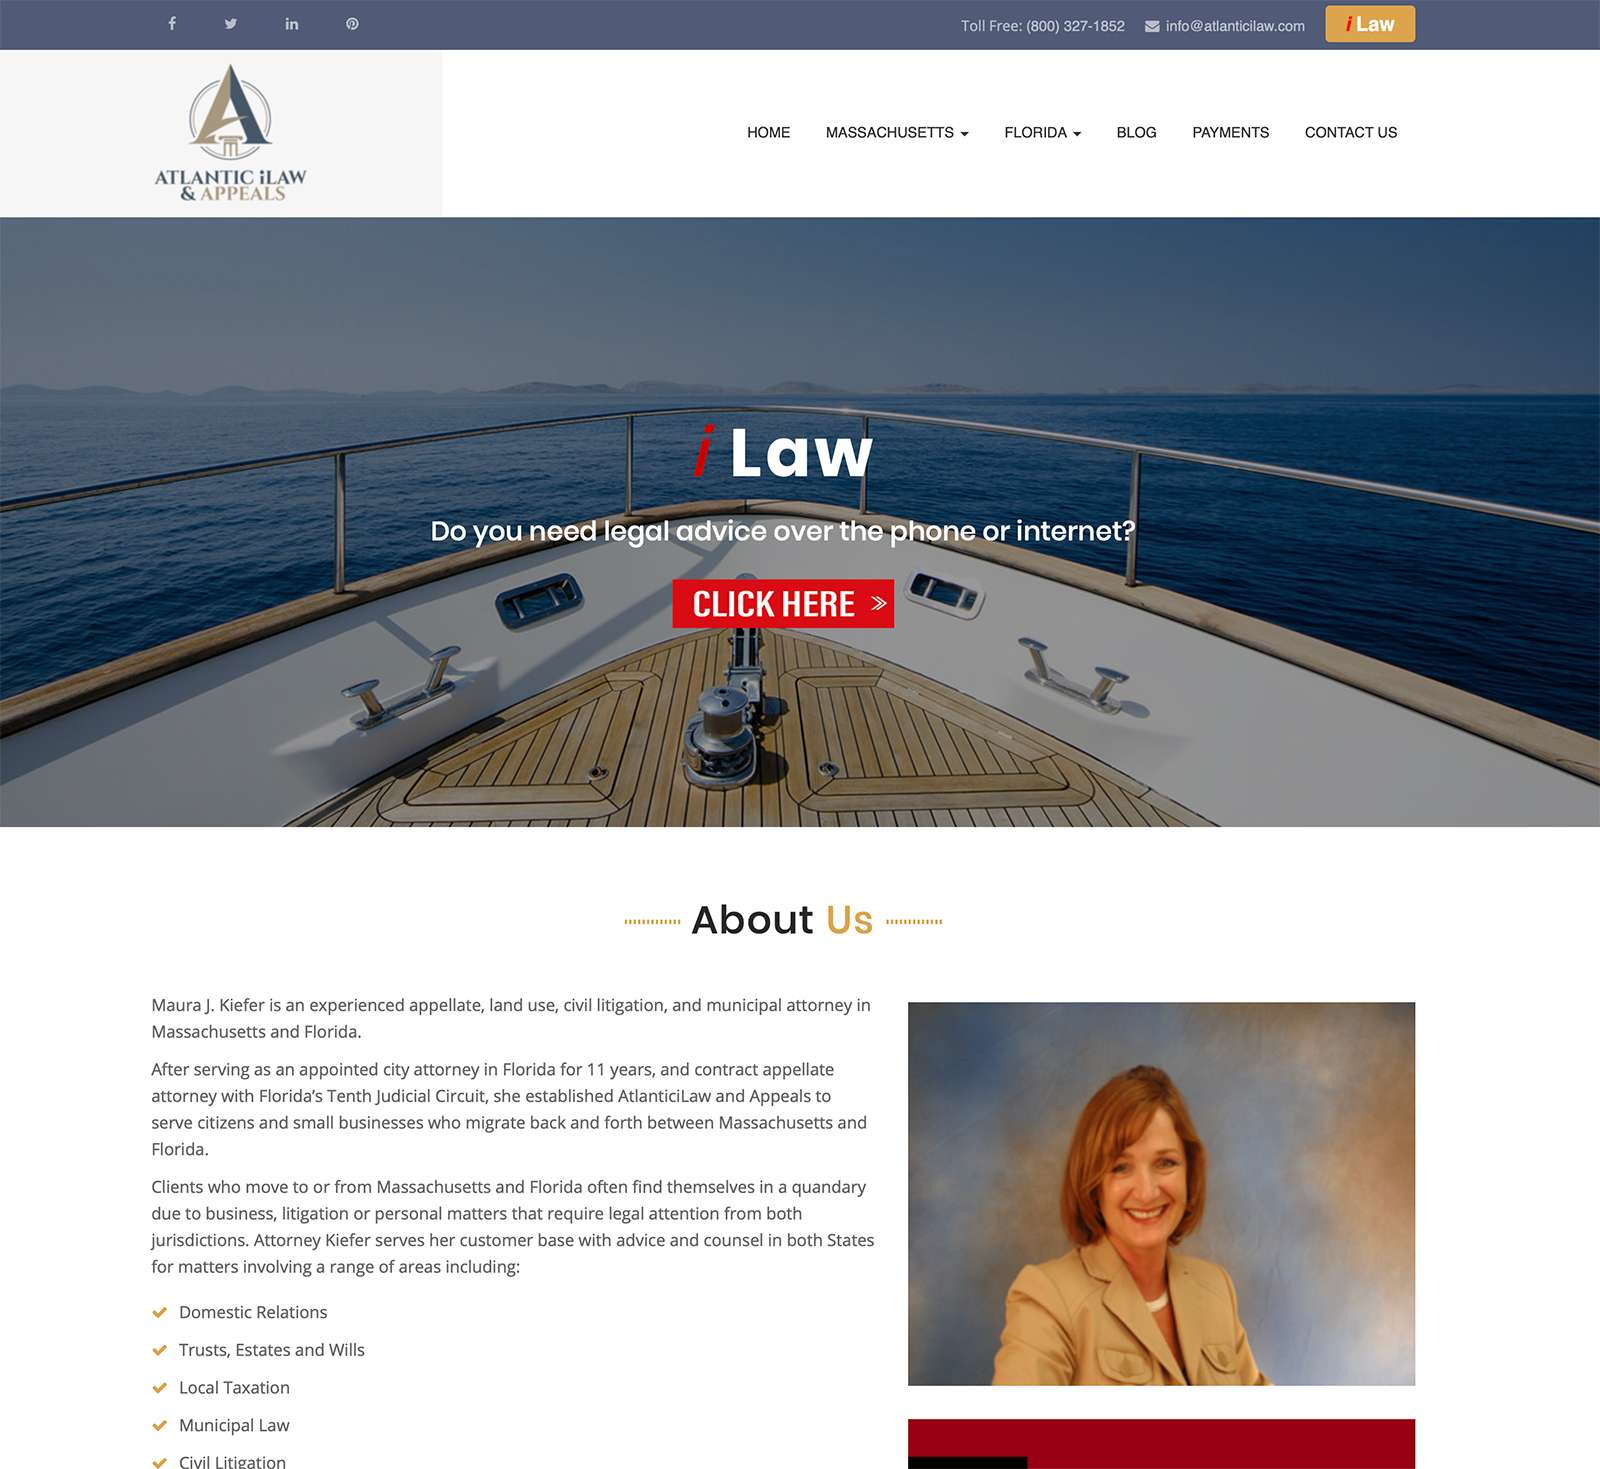 Atlantic iLaw